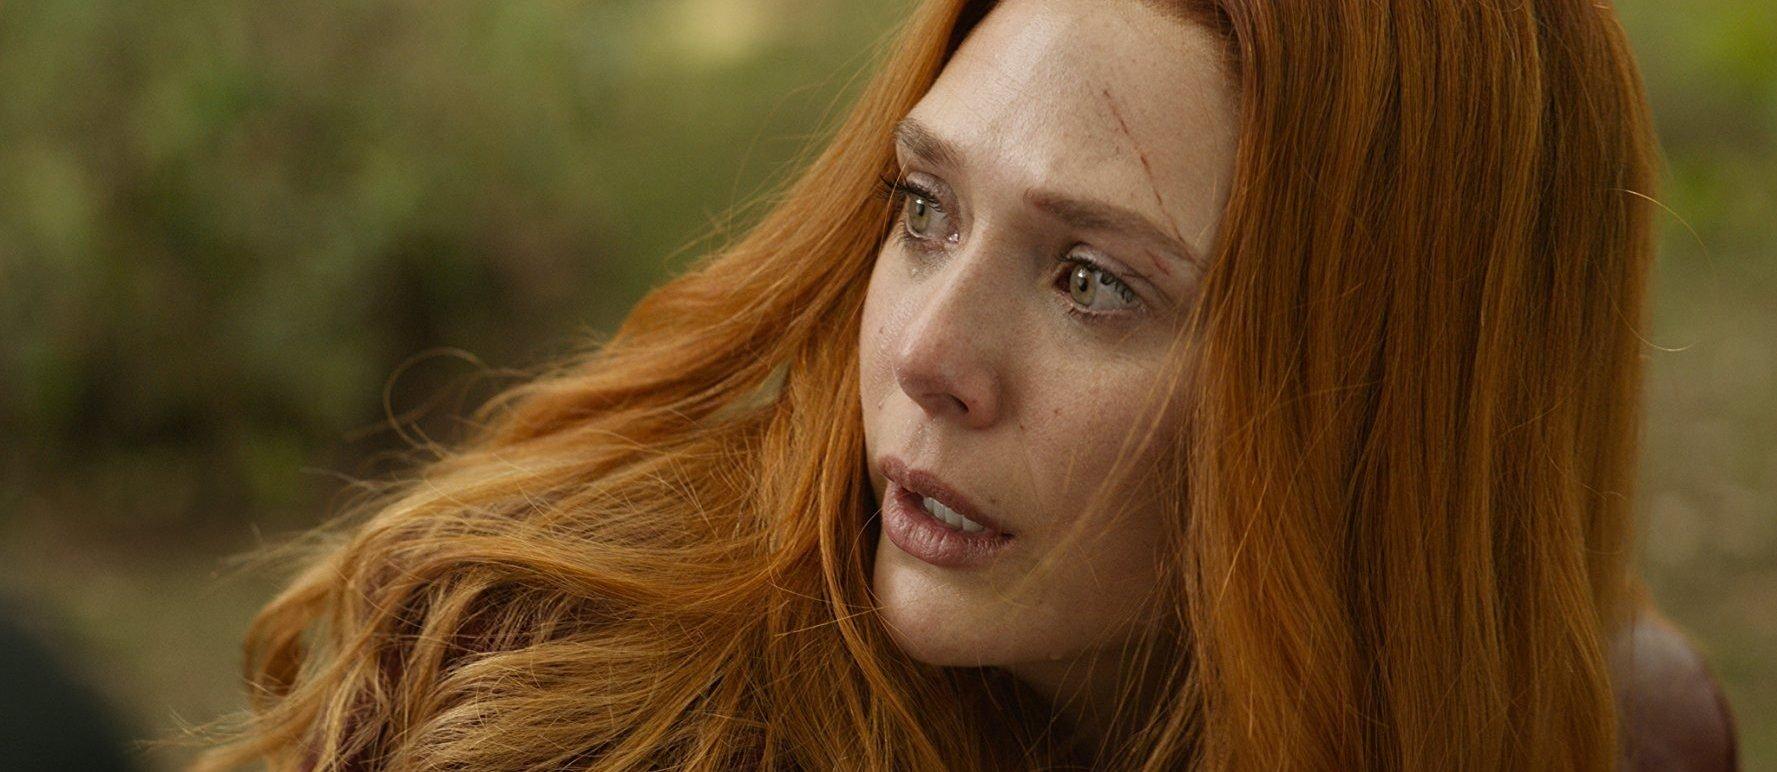 Elizabeth Olsen Auditioned for Daenerys on Game of Thrones